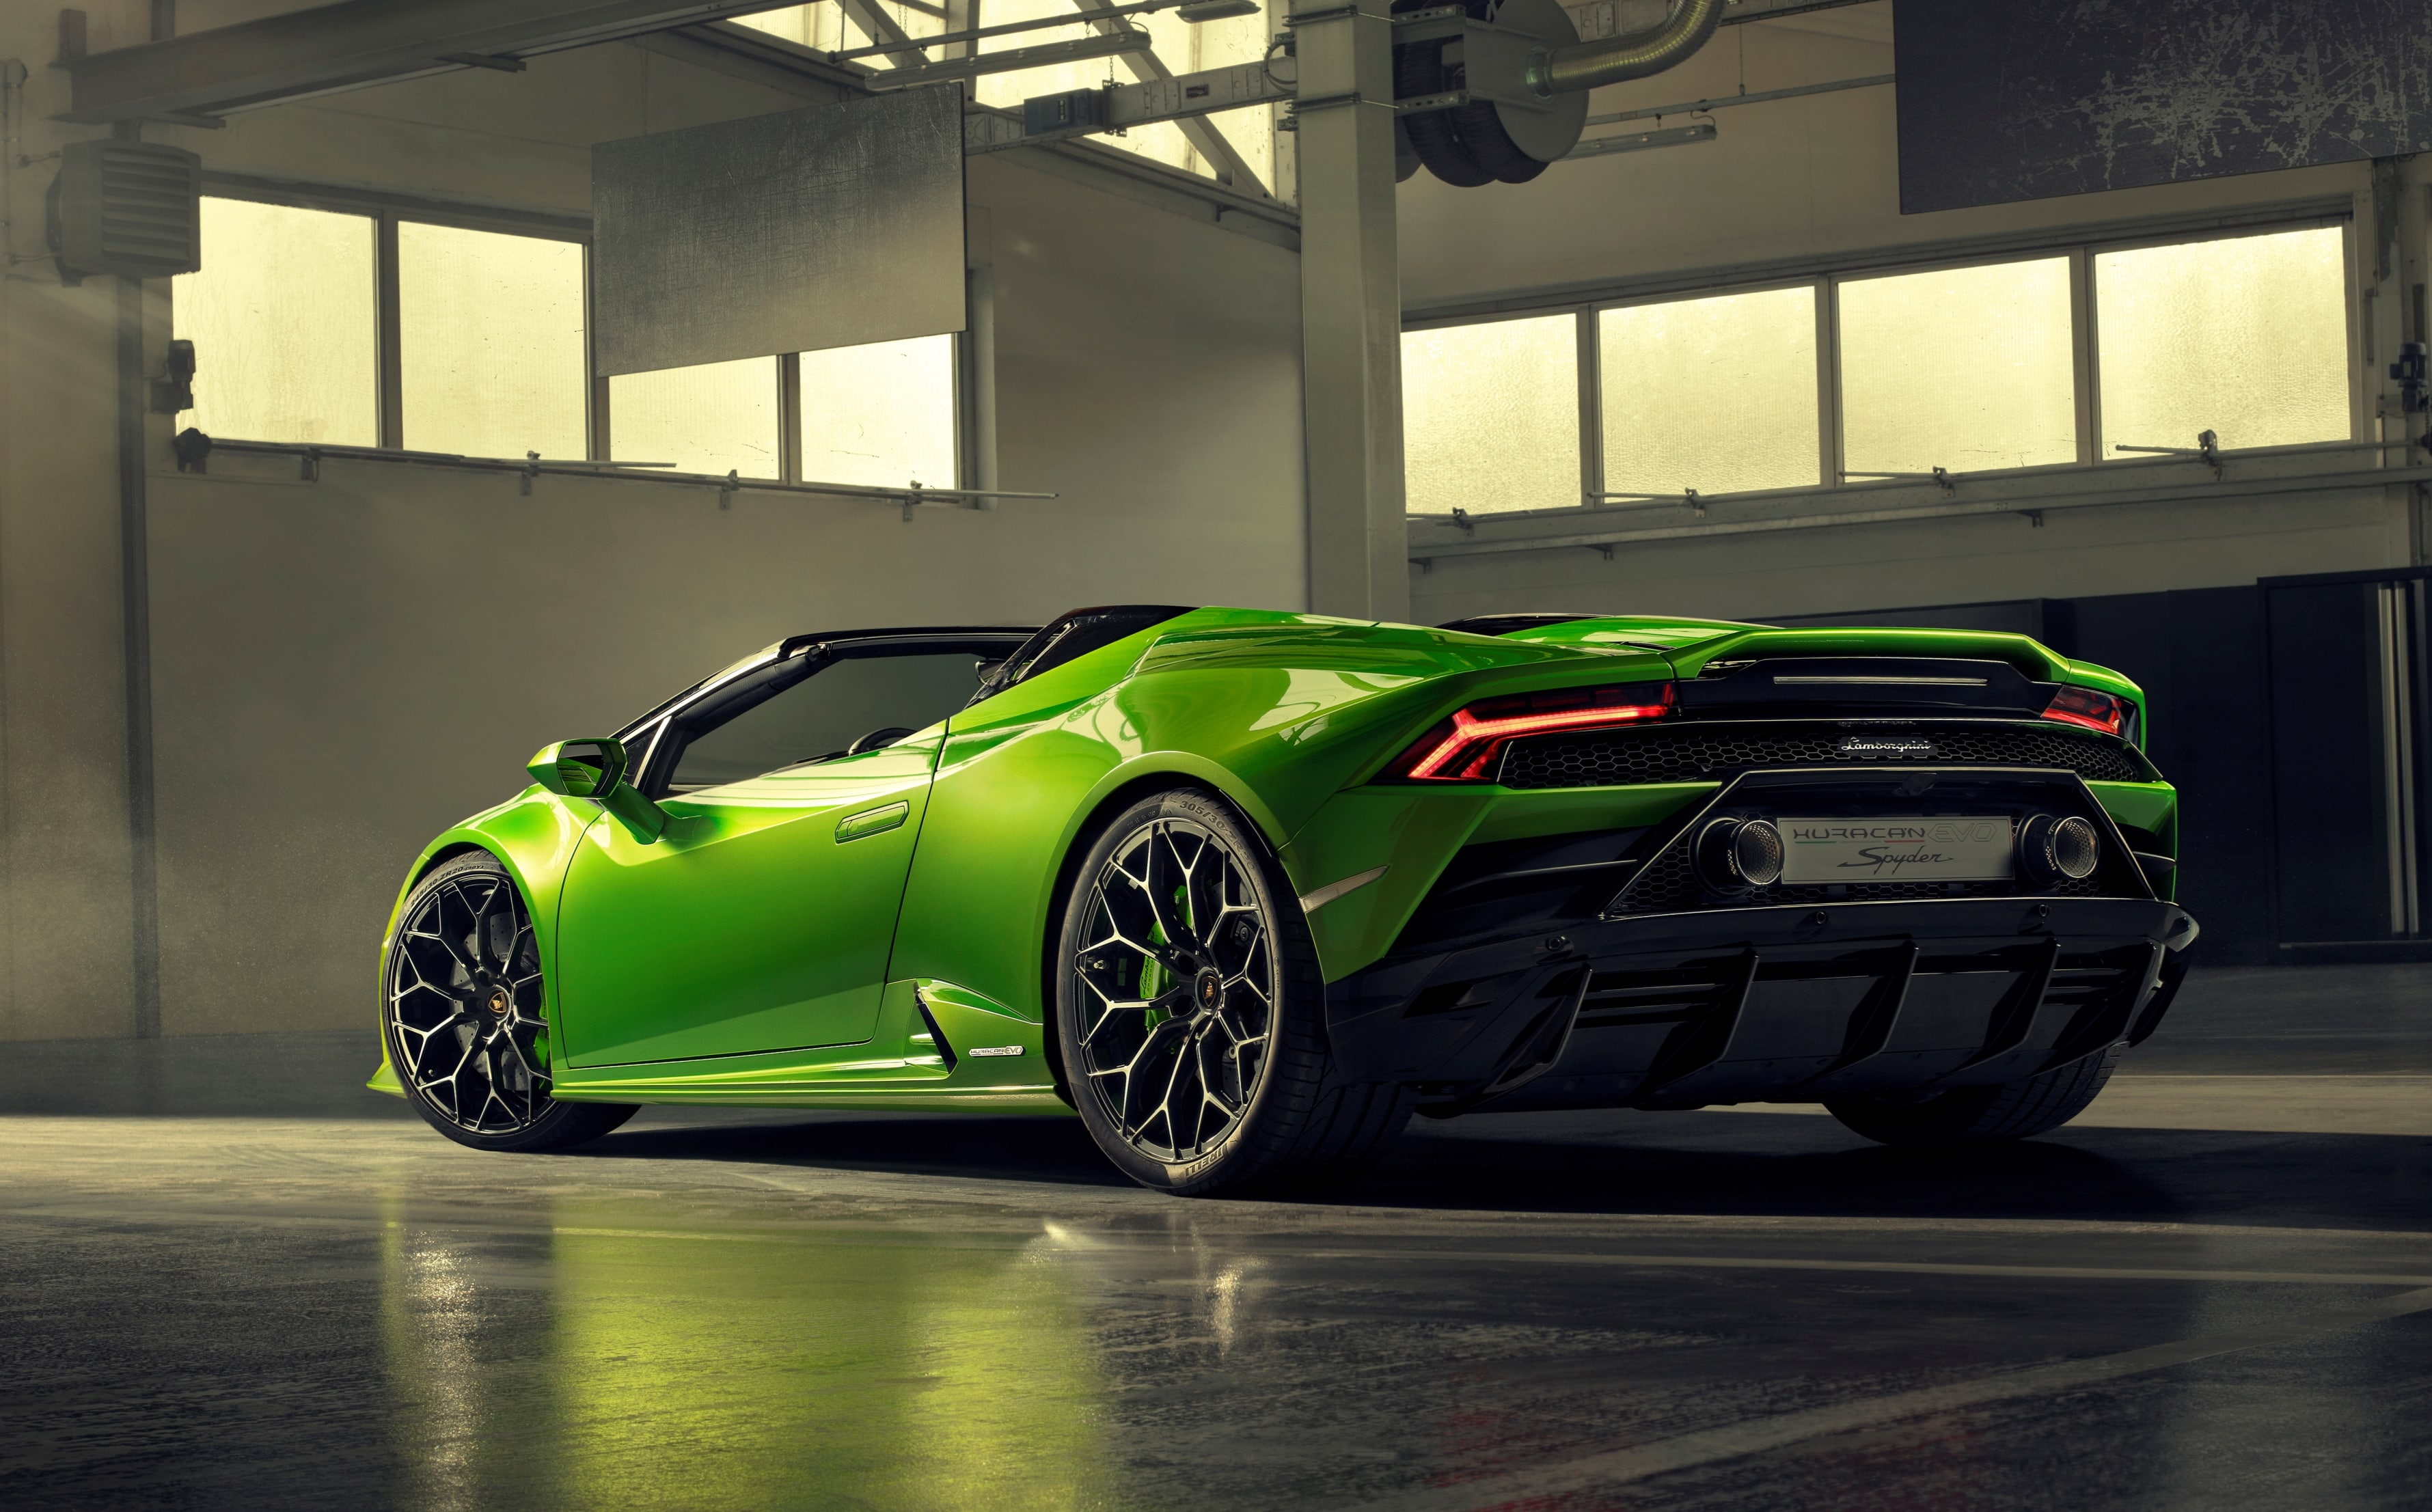 Lamborghini Huracan Evo Spyder 74 Min